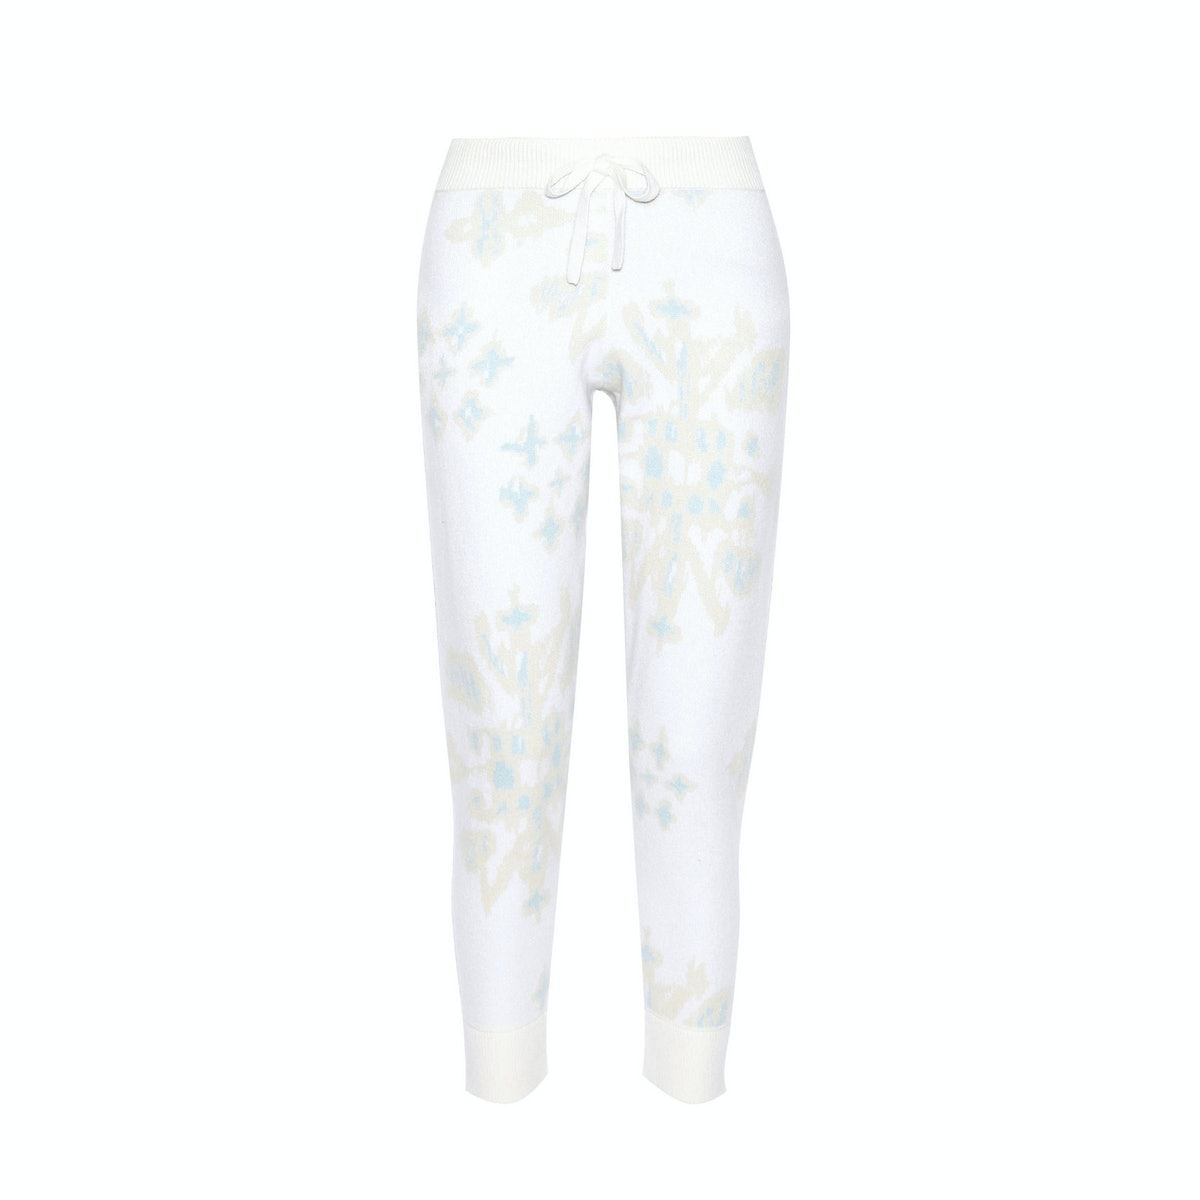 Baja East cashmere track pants